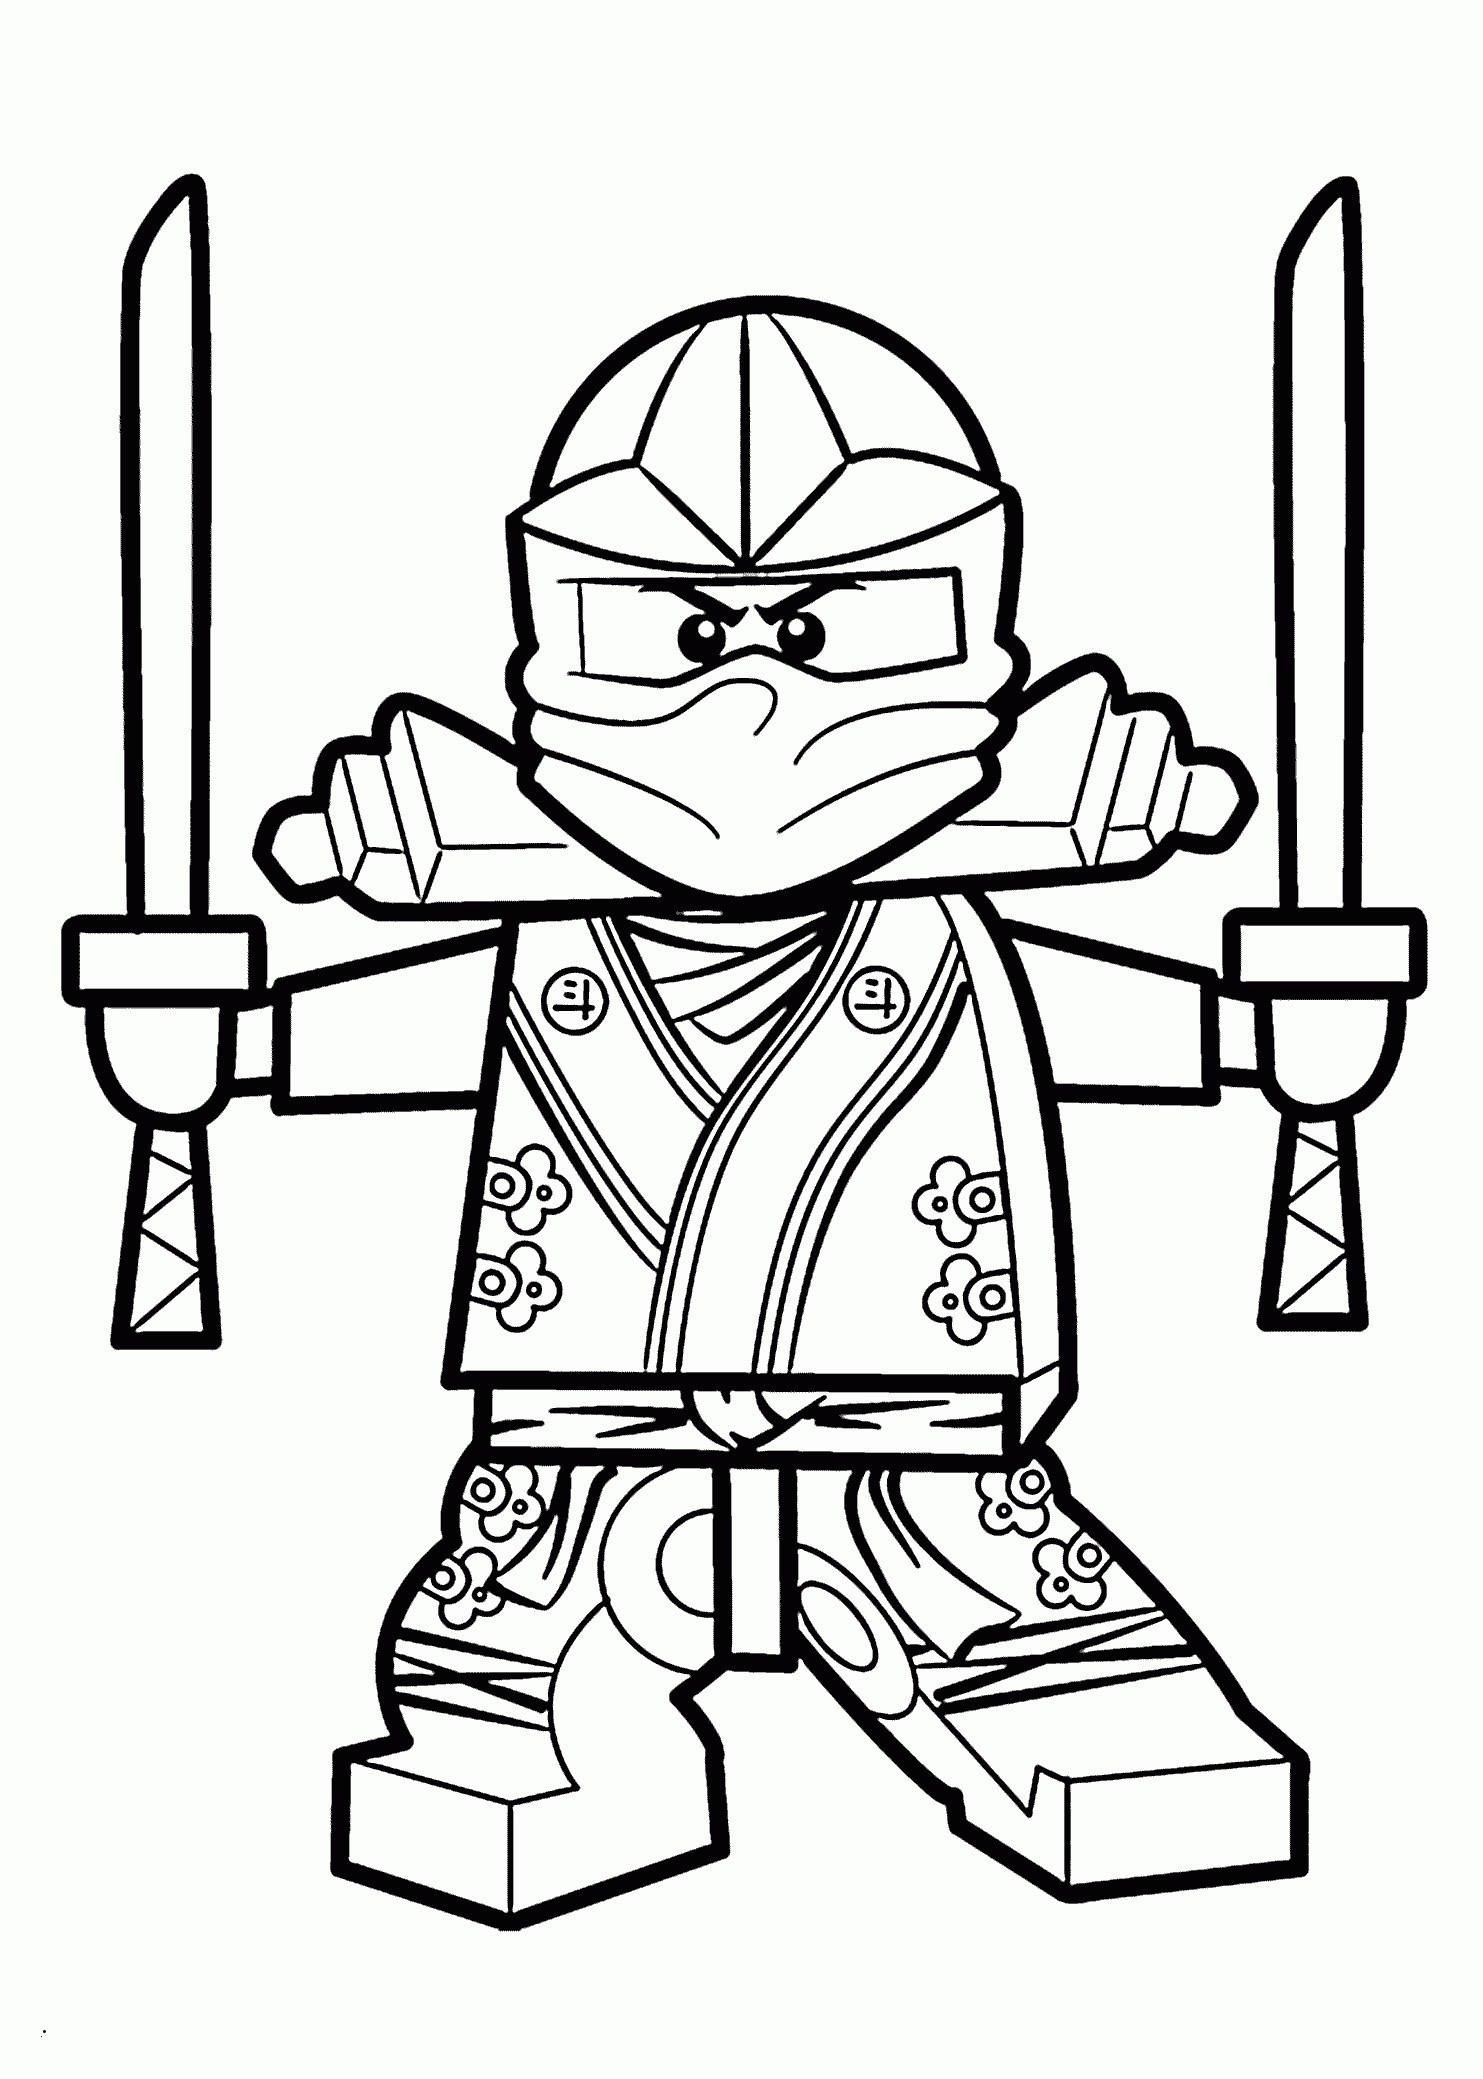 Ninjago Ausmalbilder Lord Garmadon Genial 40 Inspiration Ninjago Goldener Ninja Ausmalbilder Treehouse Nyc Stock